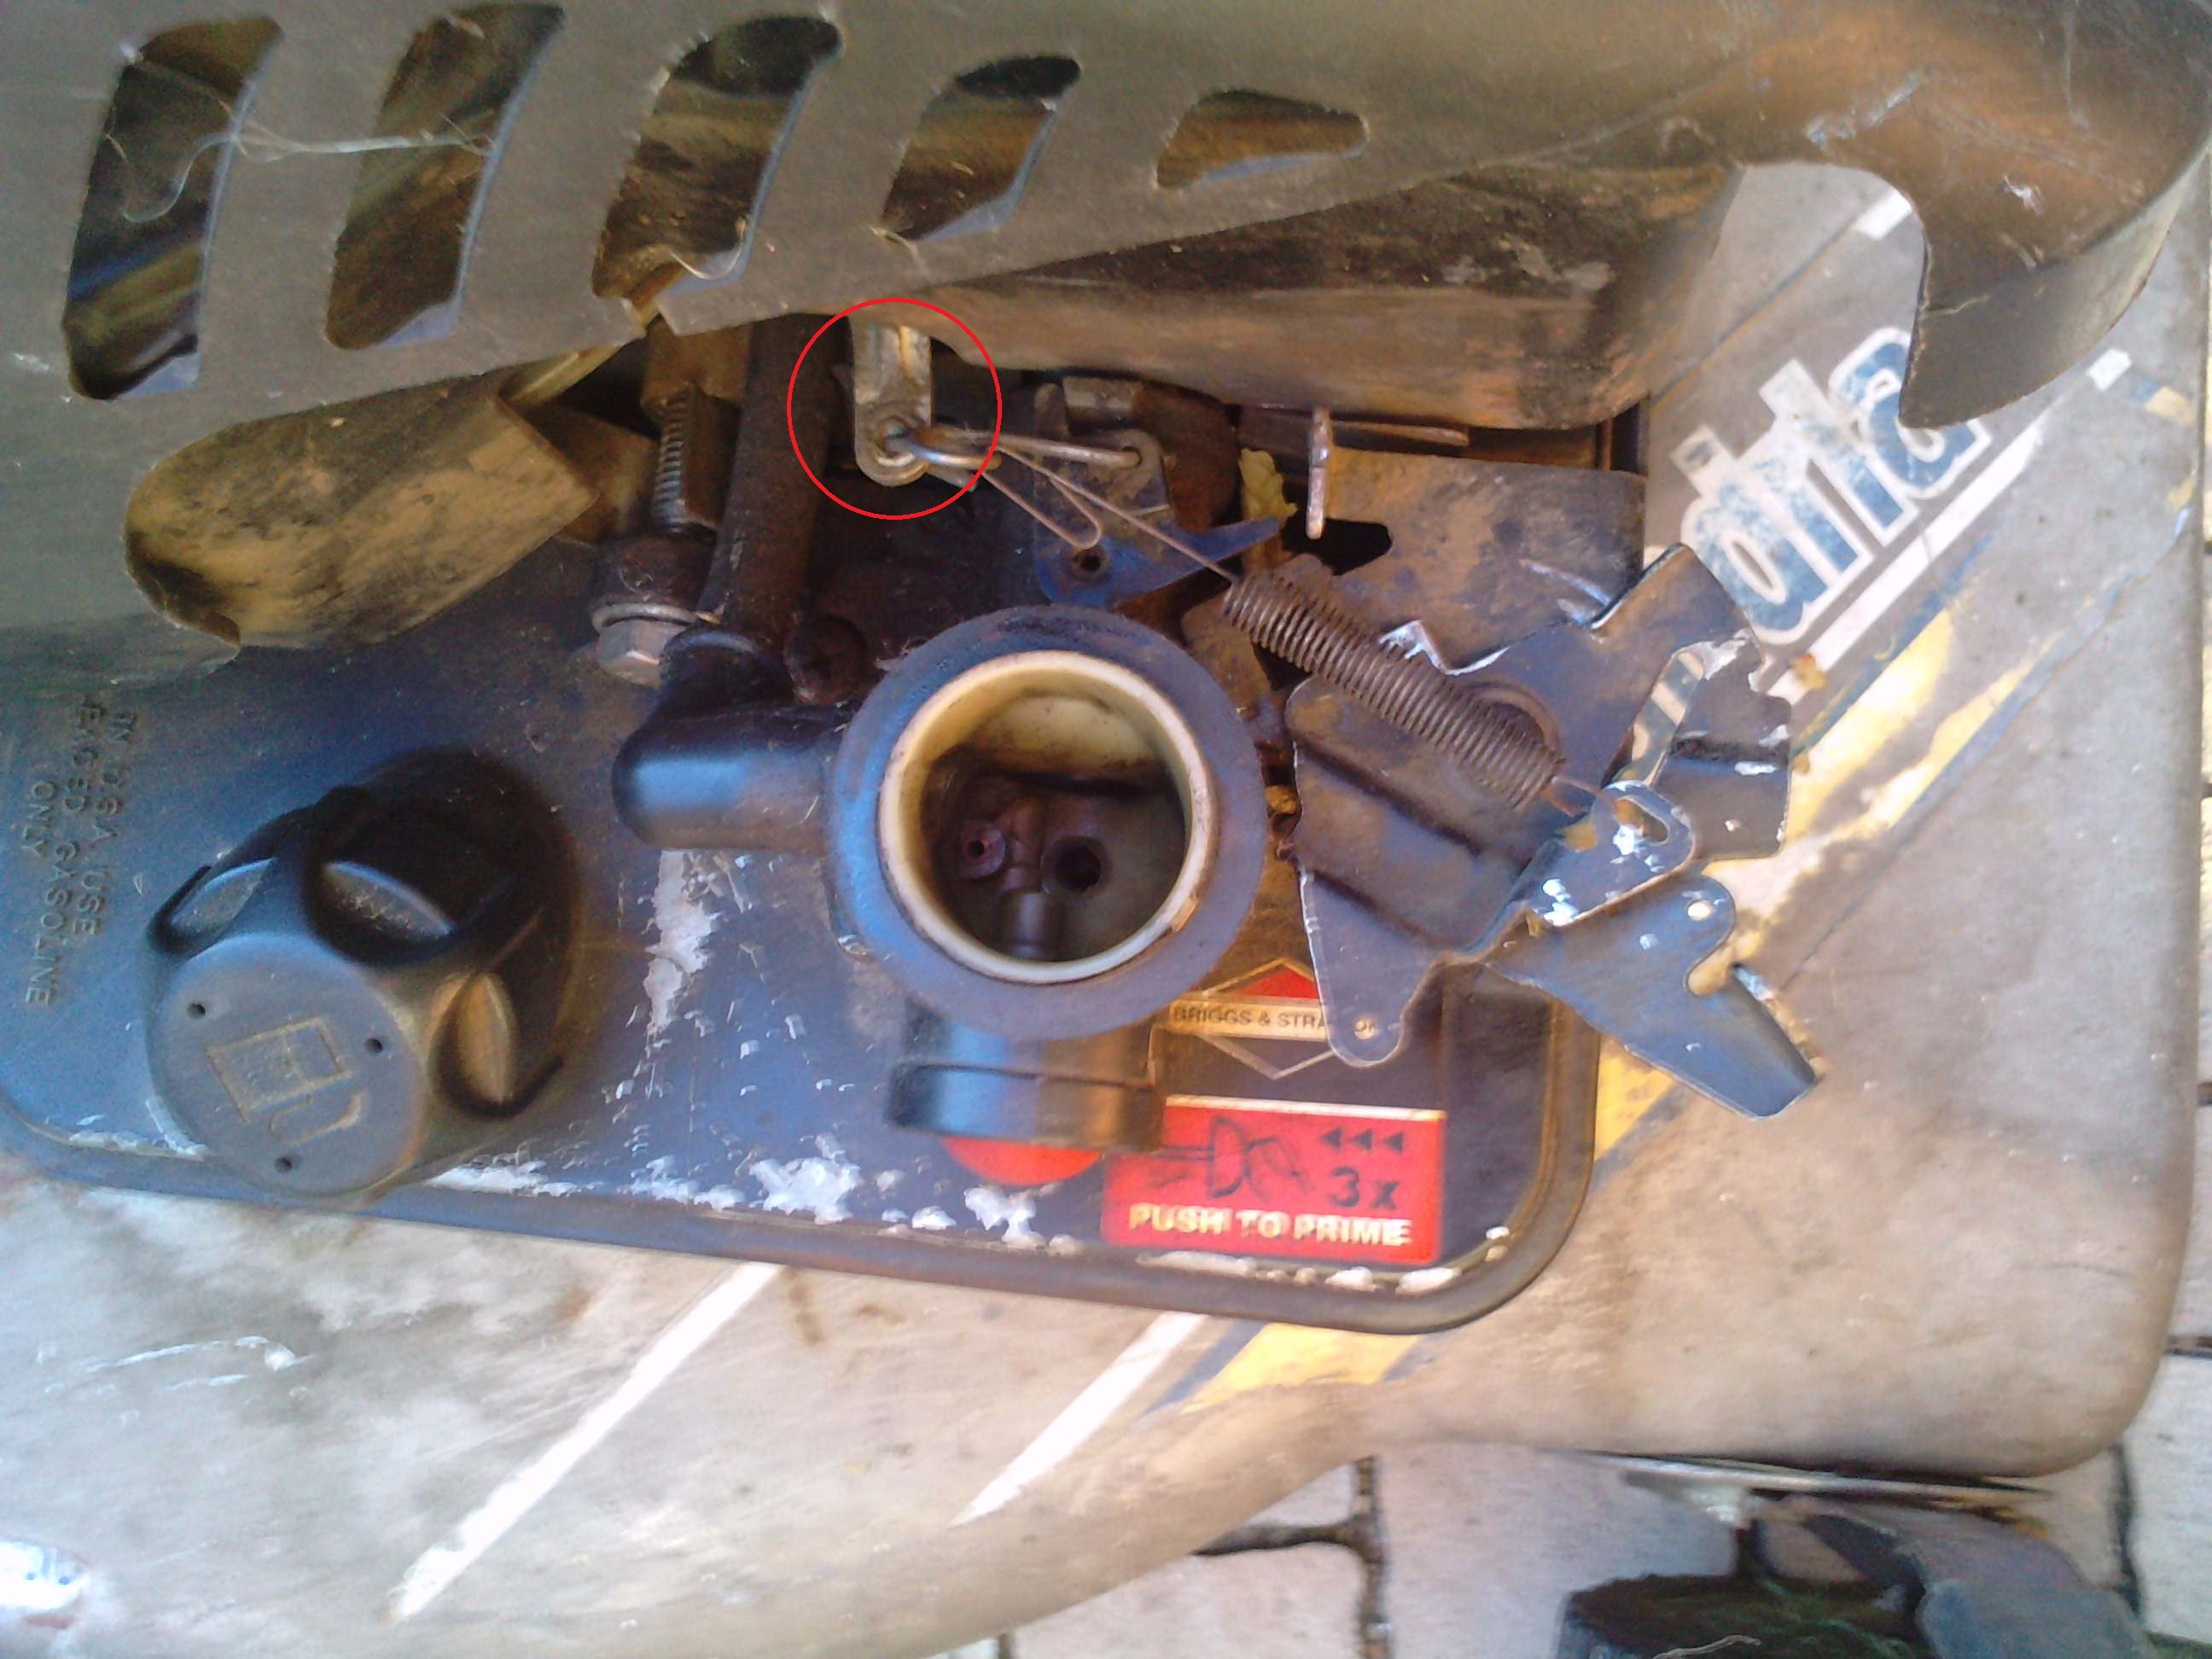 Briggs & Stratton - Nieregularna praca silnika quattro 40